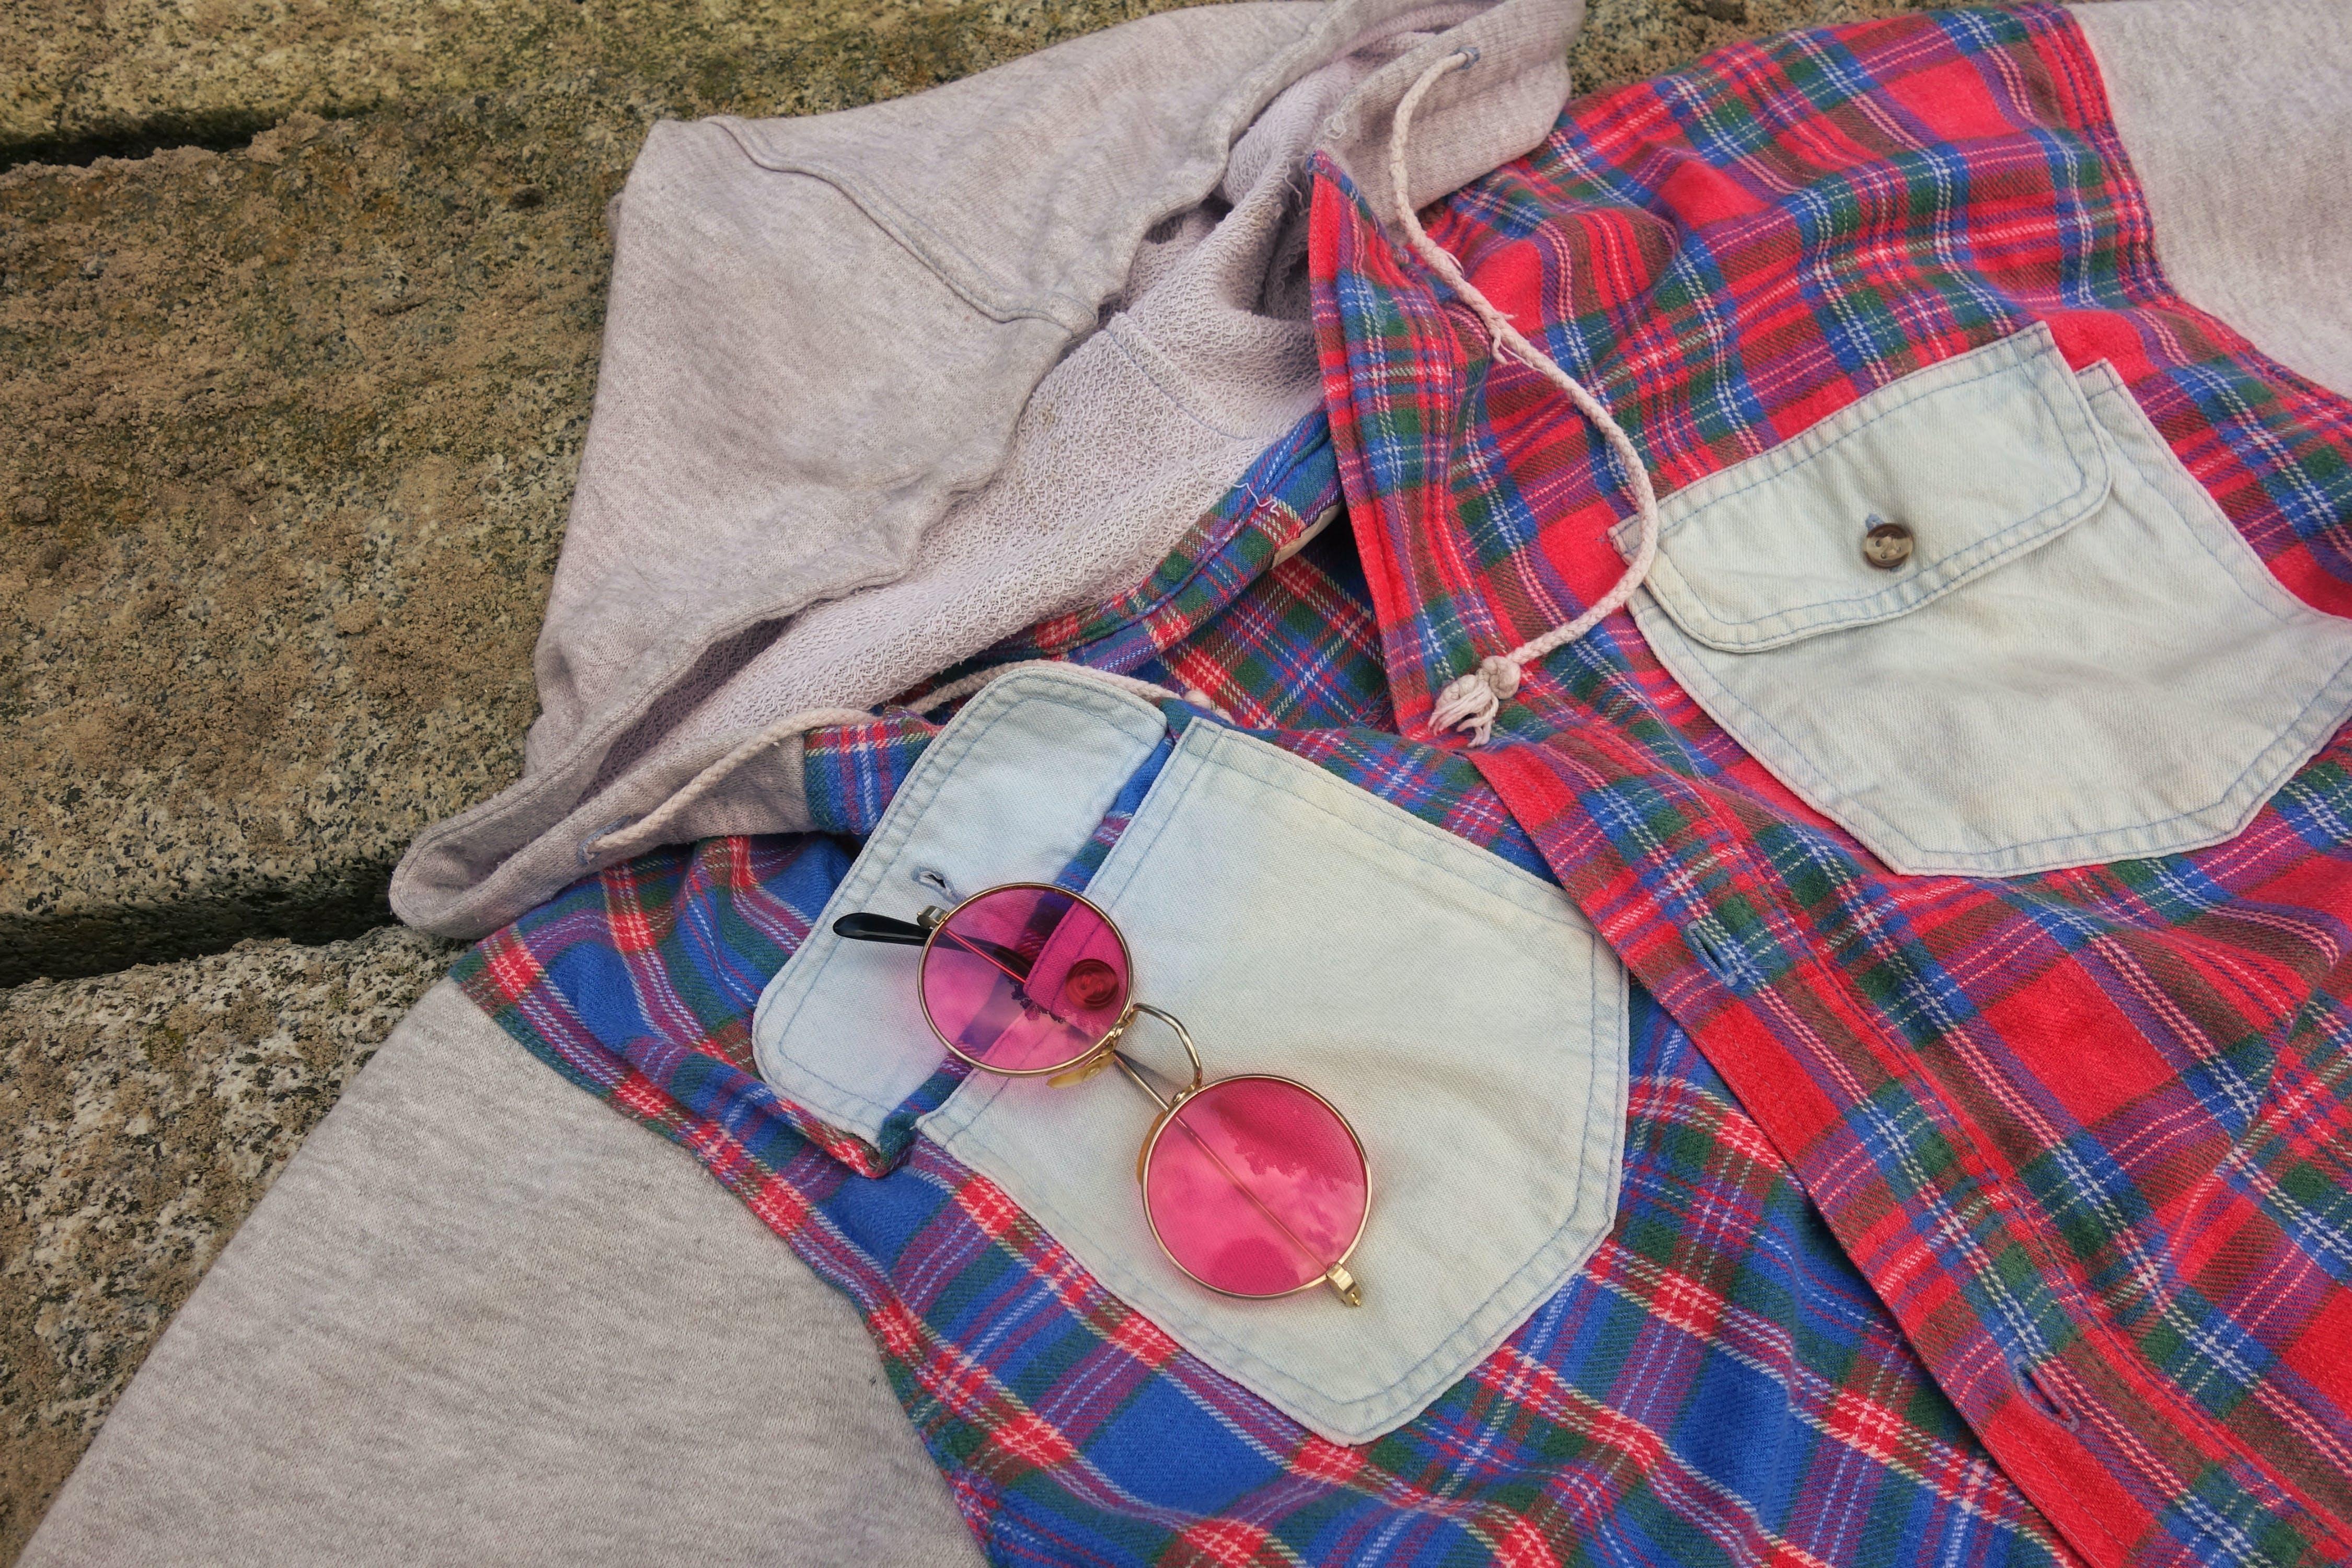 Free stock photo of shirt, clothing, garment, chequered